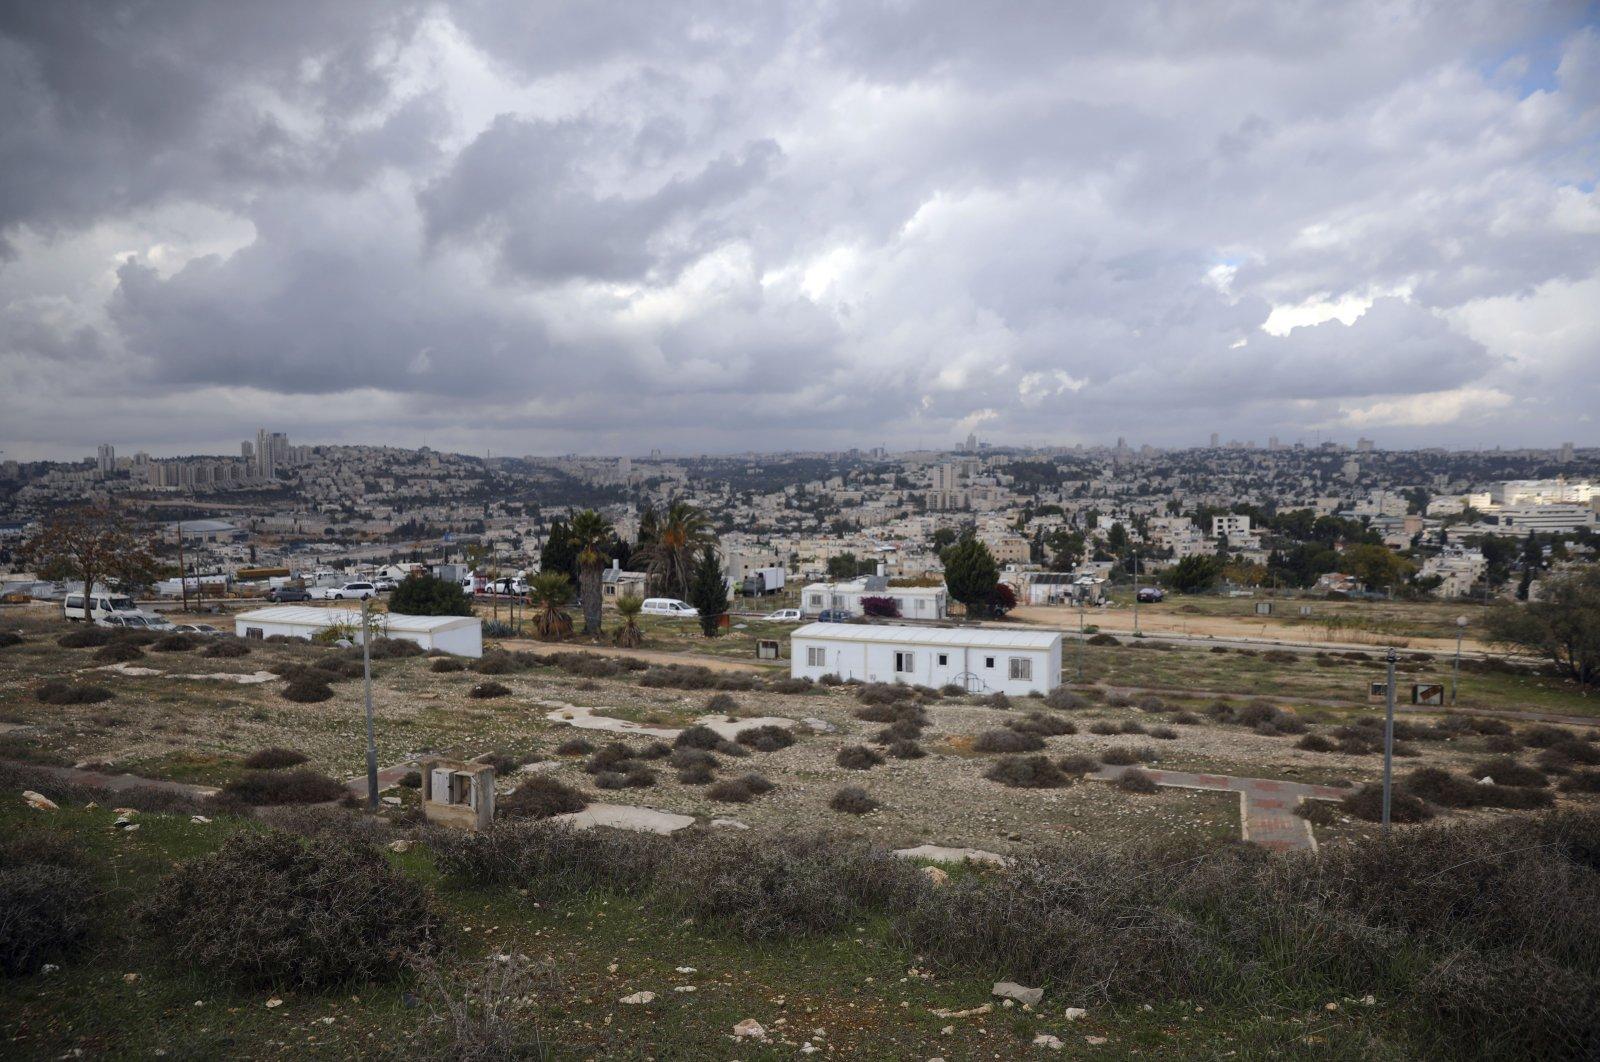 The Givat Hamatos Israeli settlement in East Jerusalem, Nov. 15, 2020. (AP Photo)